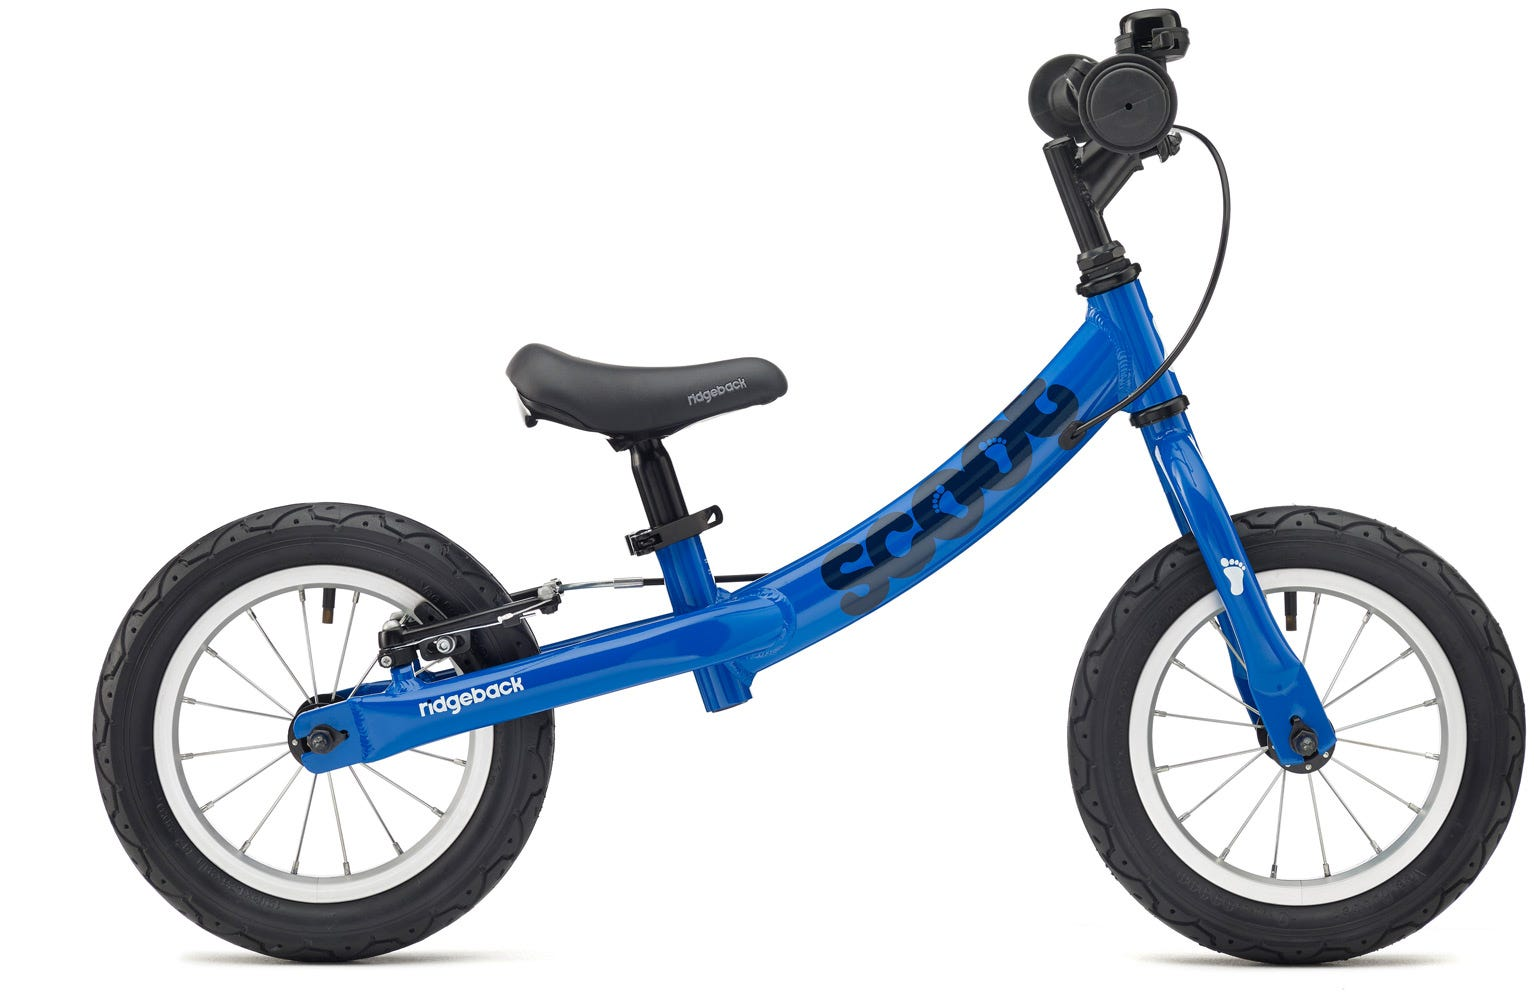 Ridgeback Scoot 2018 - Youth Beginner Bike